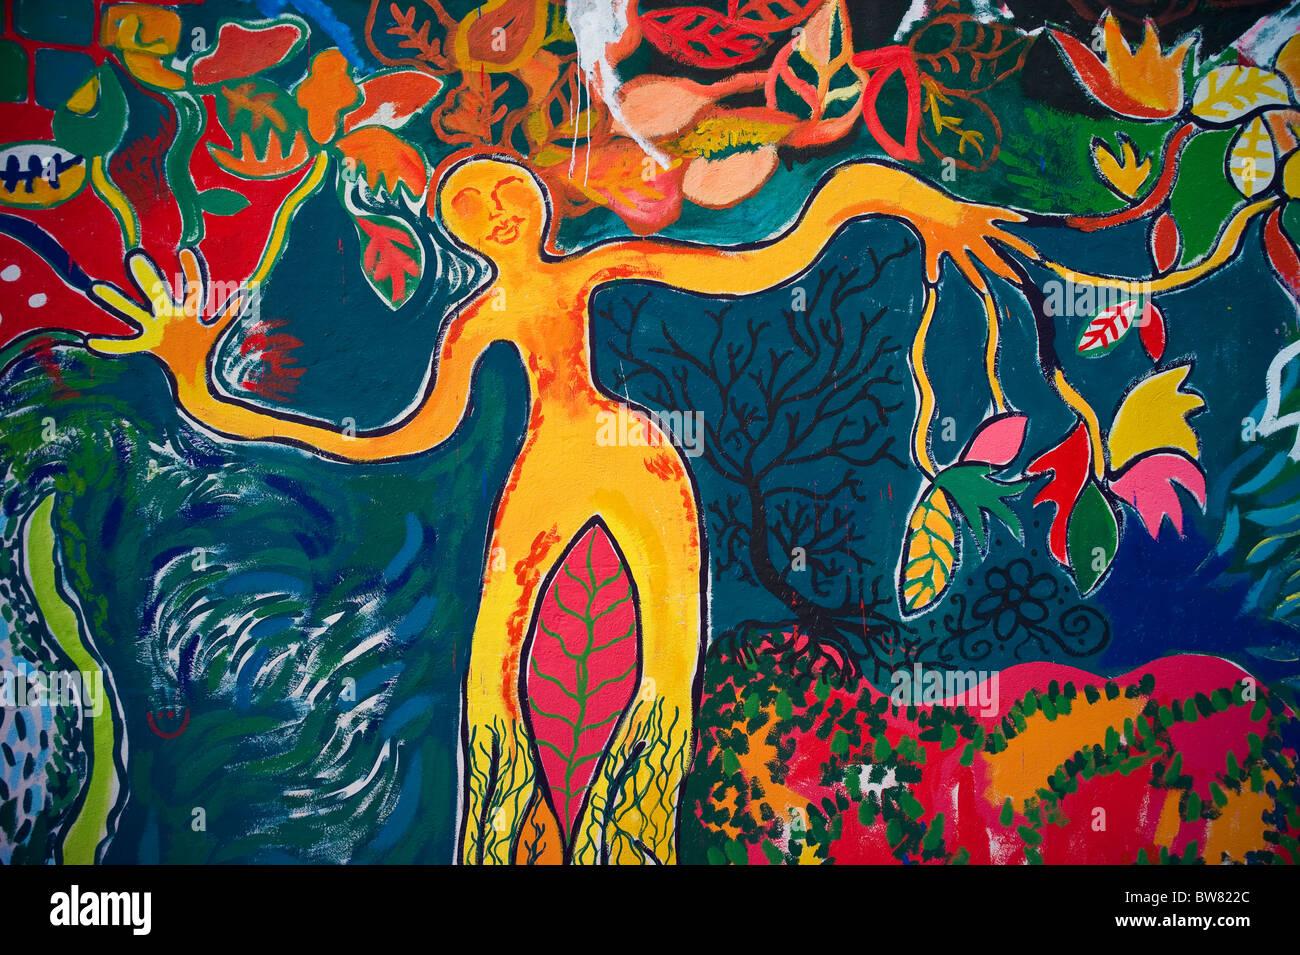 La Peinture Murale Abstraite Coloree De La Mere Nature Quito